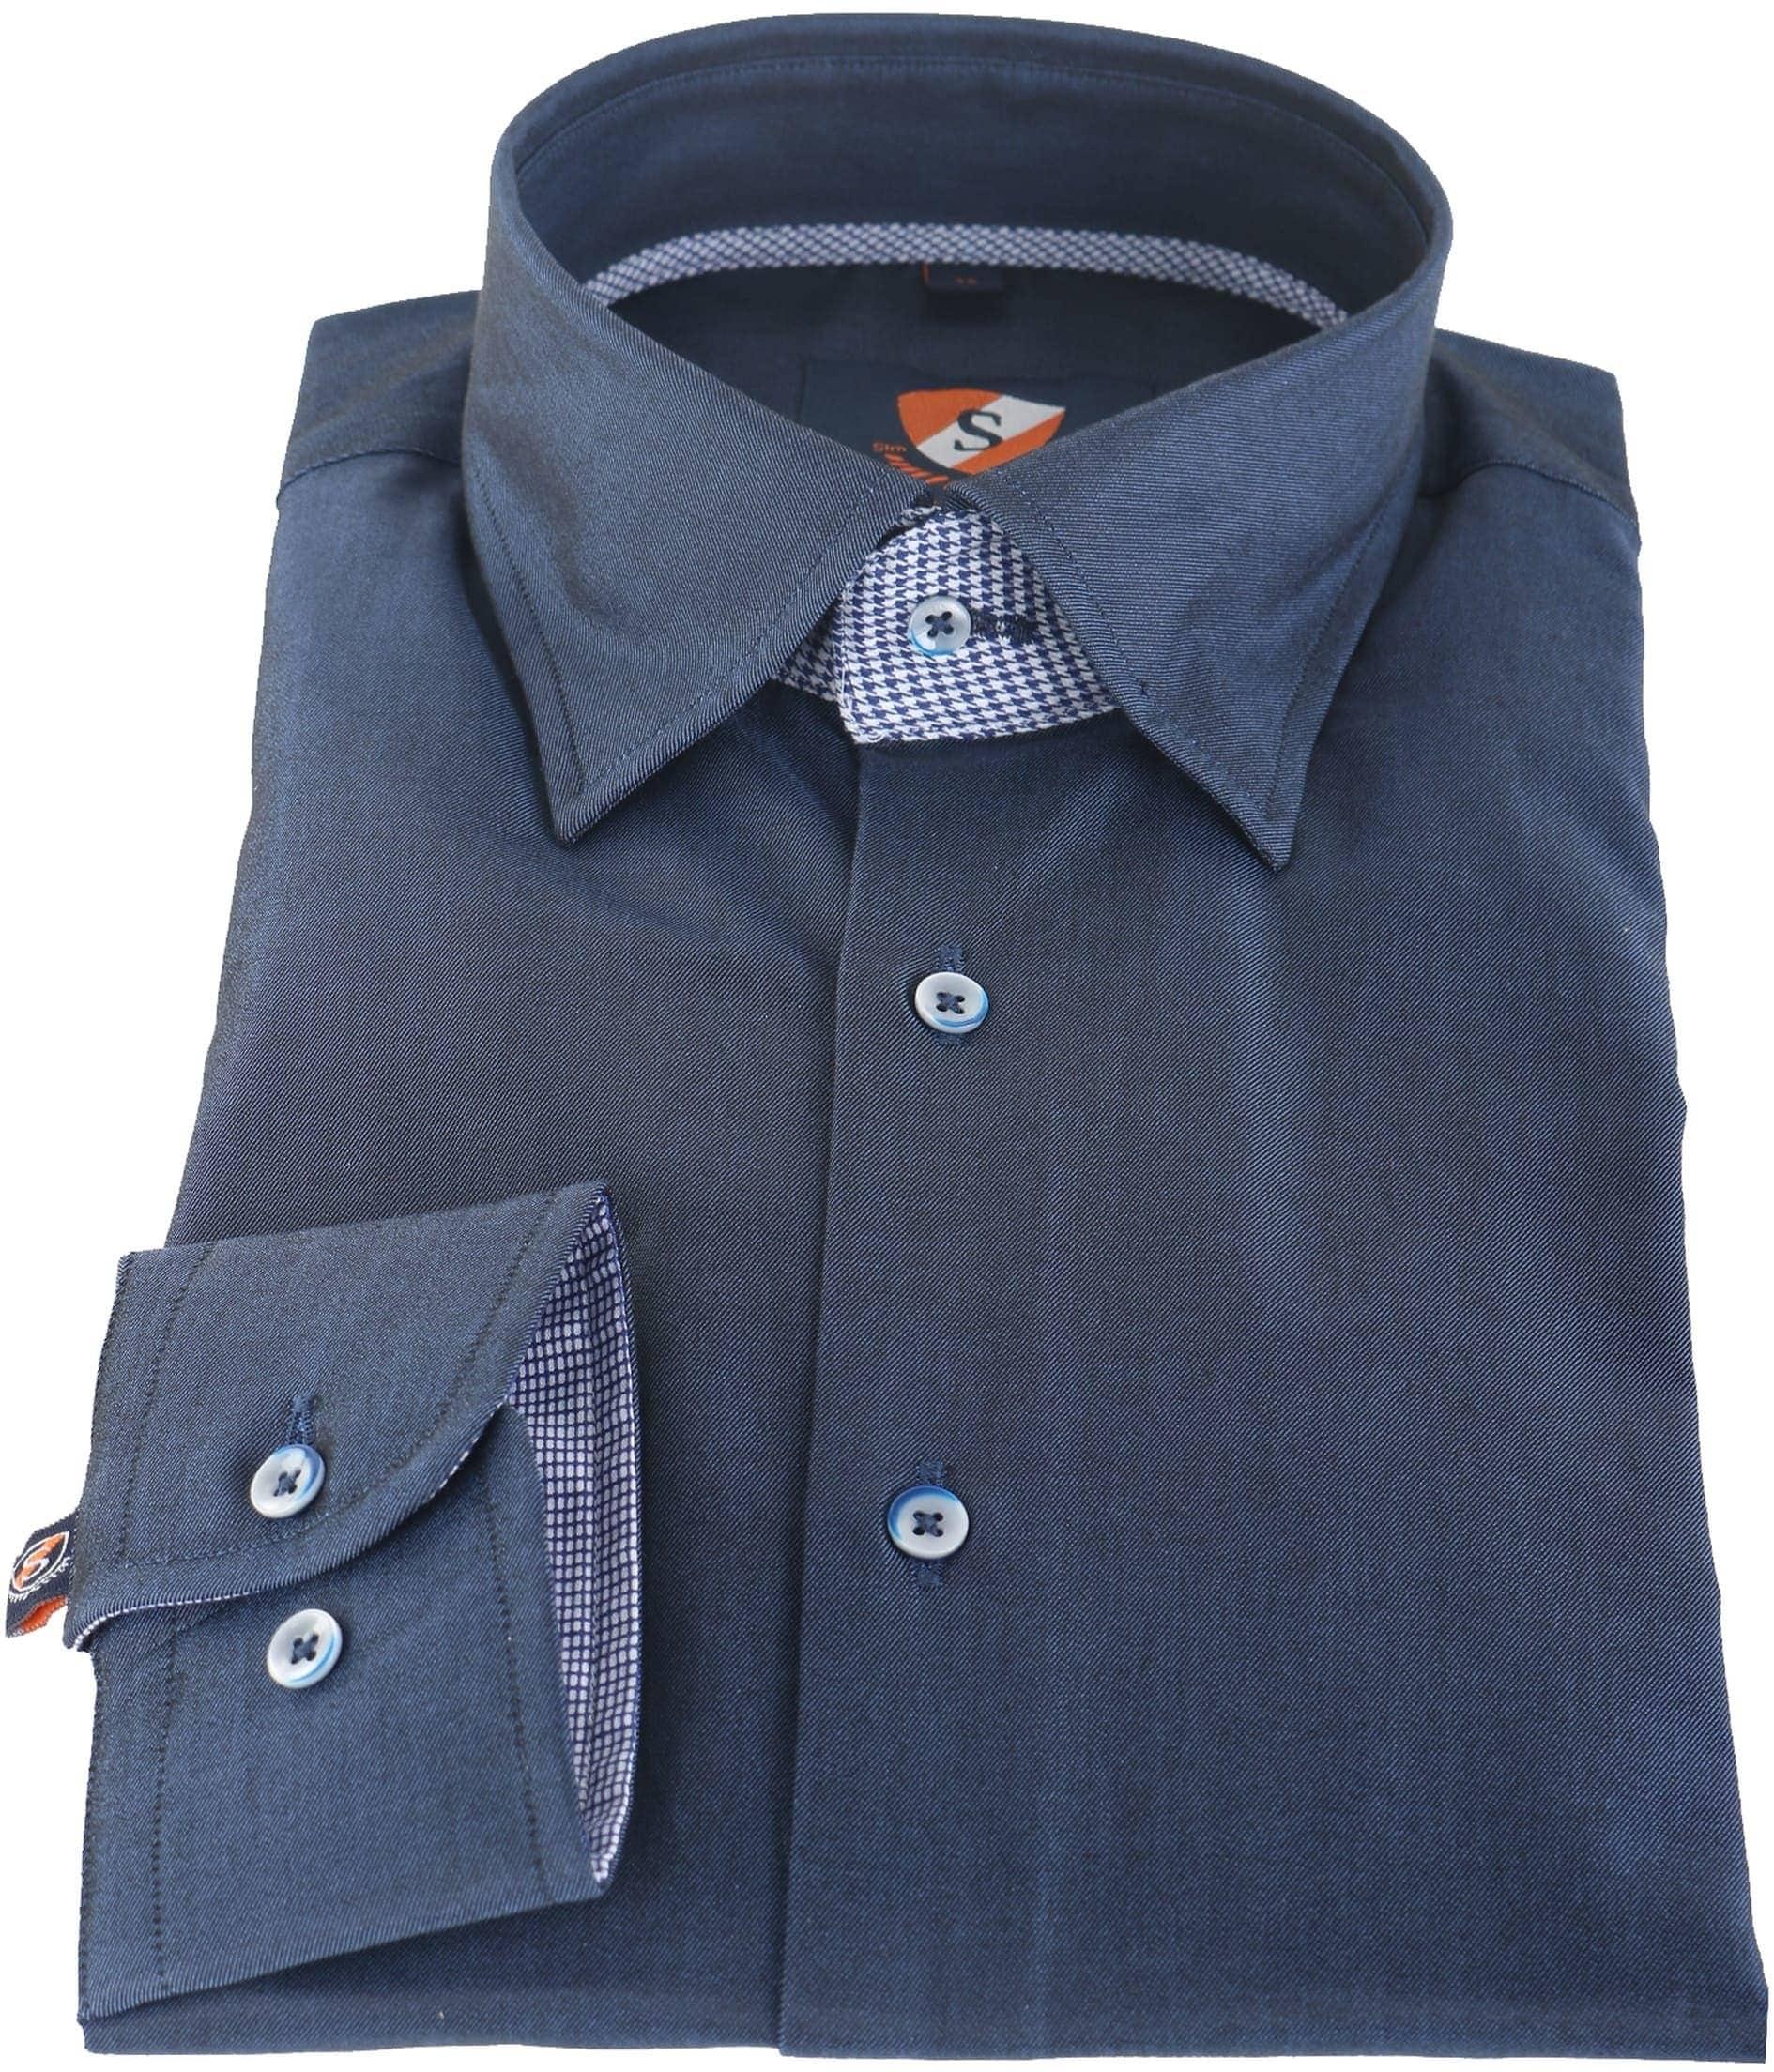 Suitable Overhemd Donkerblauw 145-3 foto 1